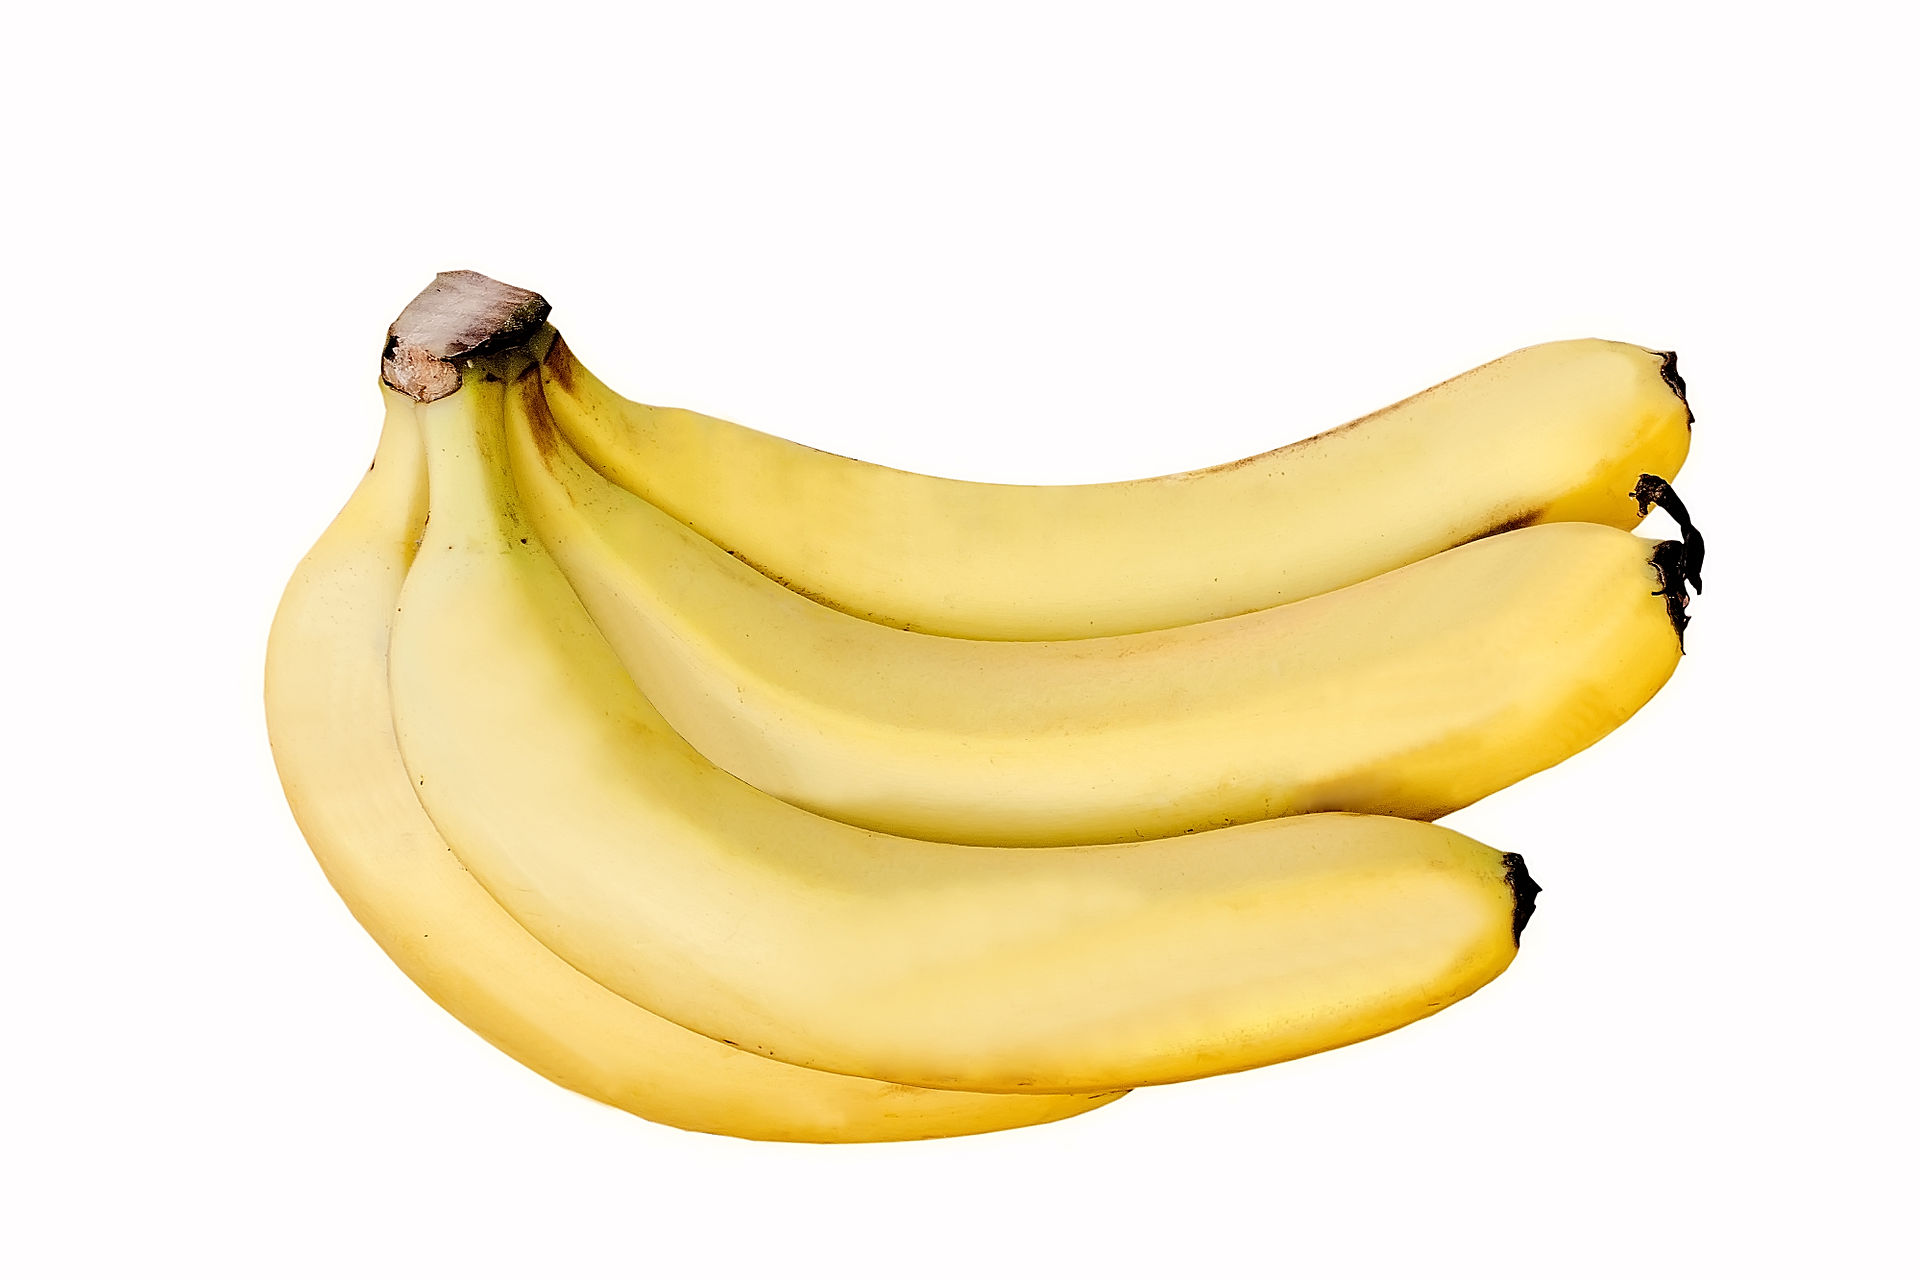 With banana foto 69